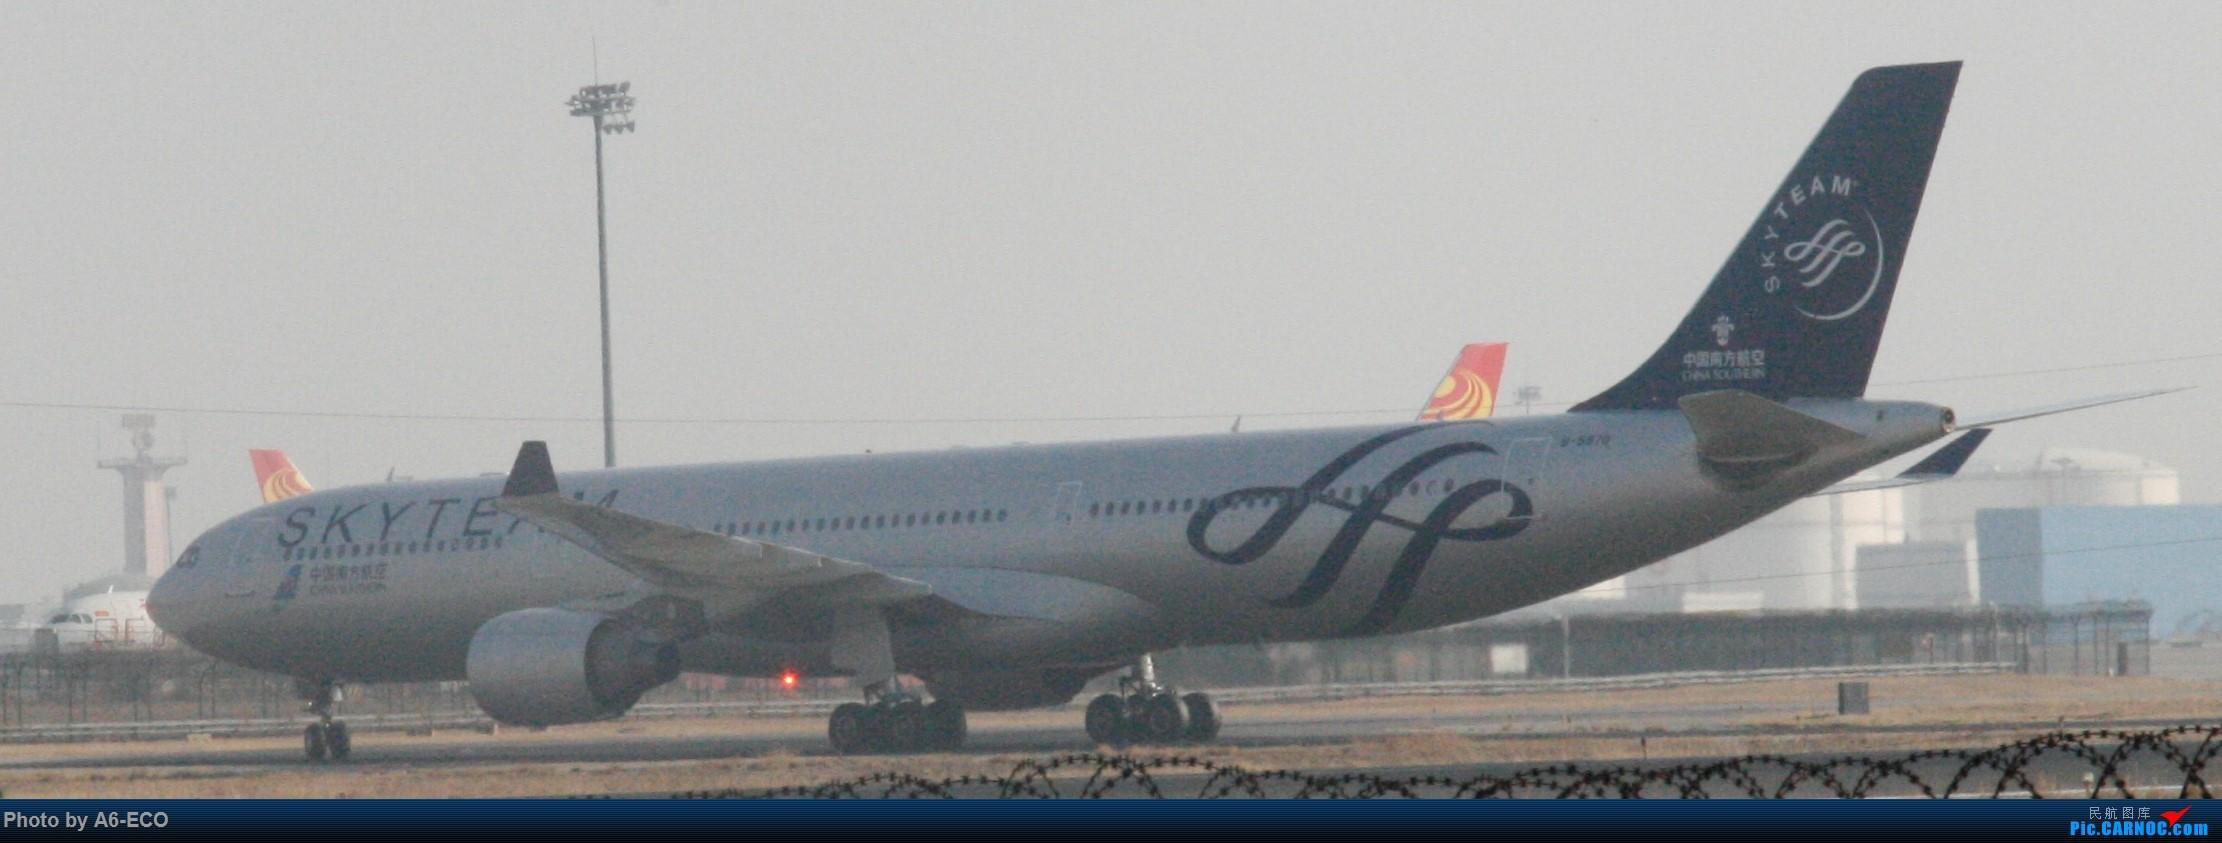 Re:[原创]今天运气极好,云南孔雀,B-1070,2个菜航邮戳,泡菜航彩绘,东航邮戳...... AIRBUS A330-300 B-5970 中国北京首都国际机场